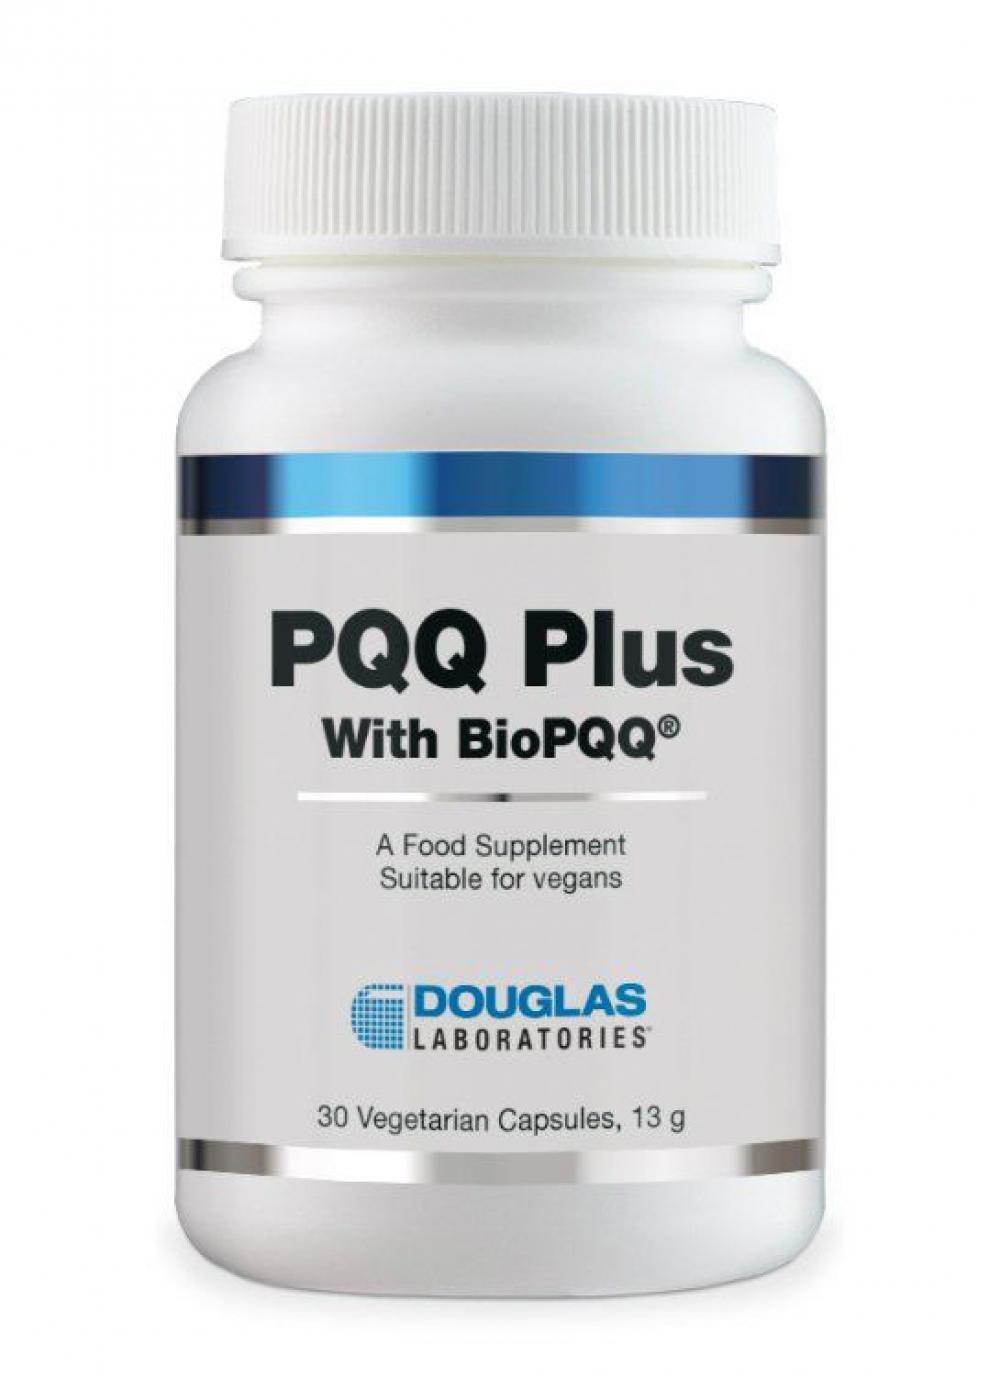 Douglas Laboratories Europe PQQ Plus with BioPQQ 30 veg. Kapseln (13g)